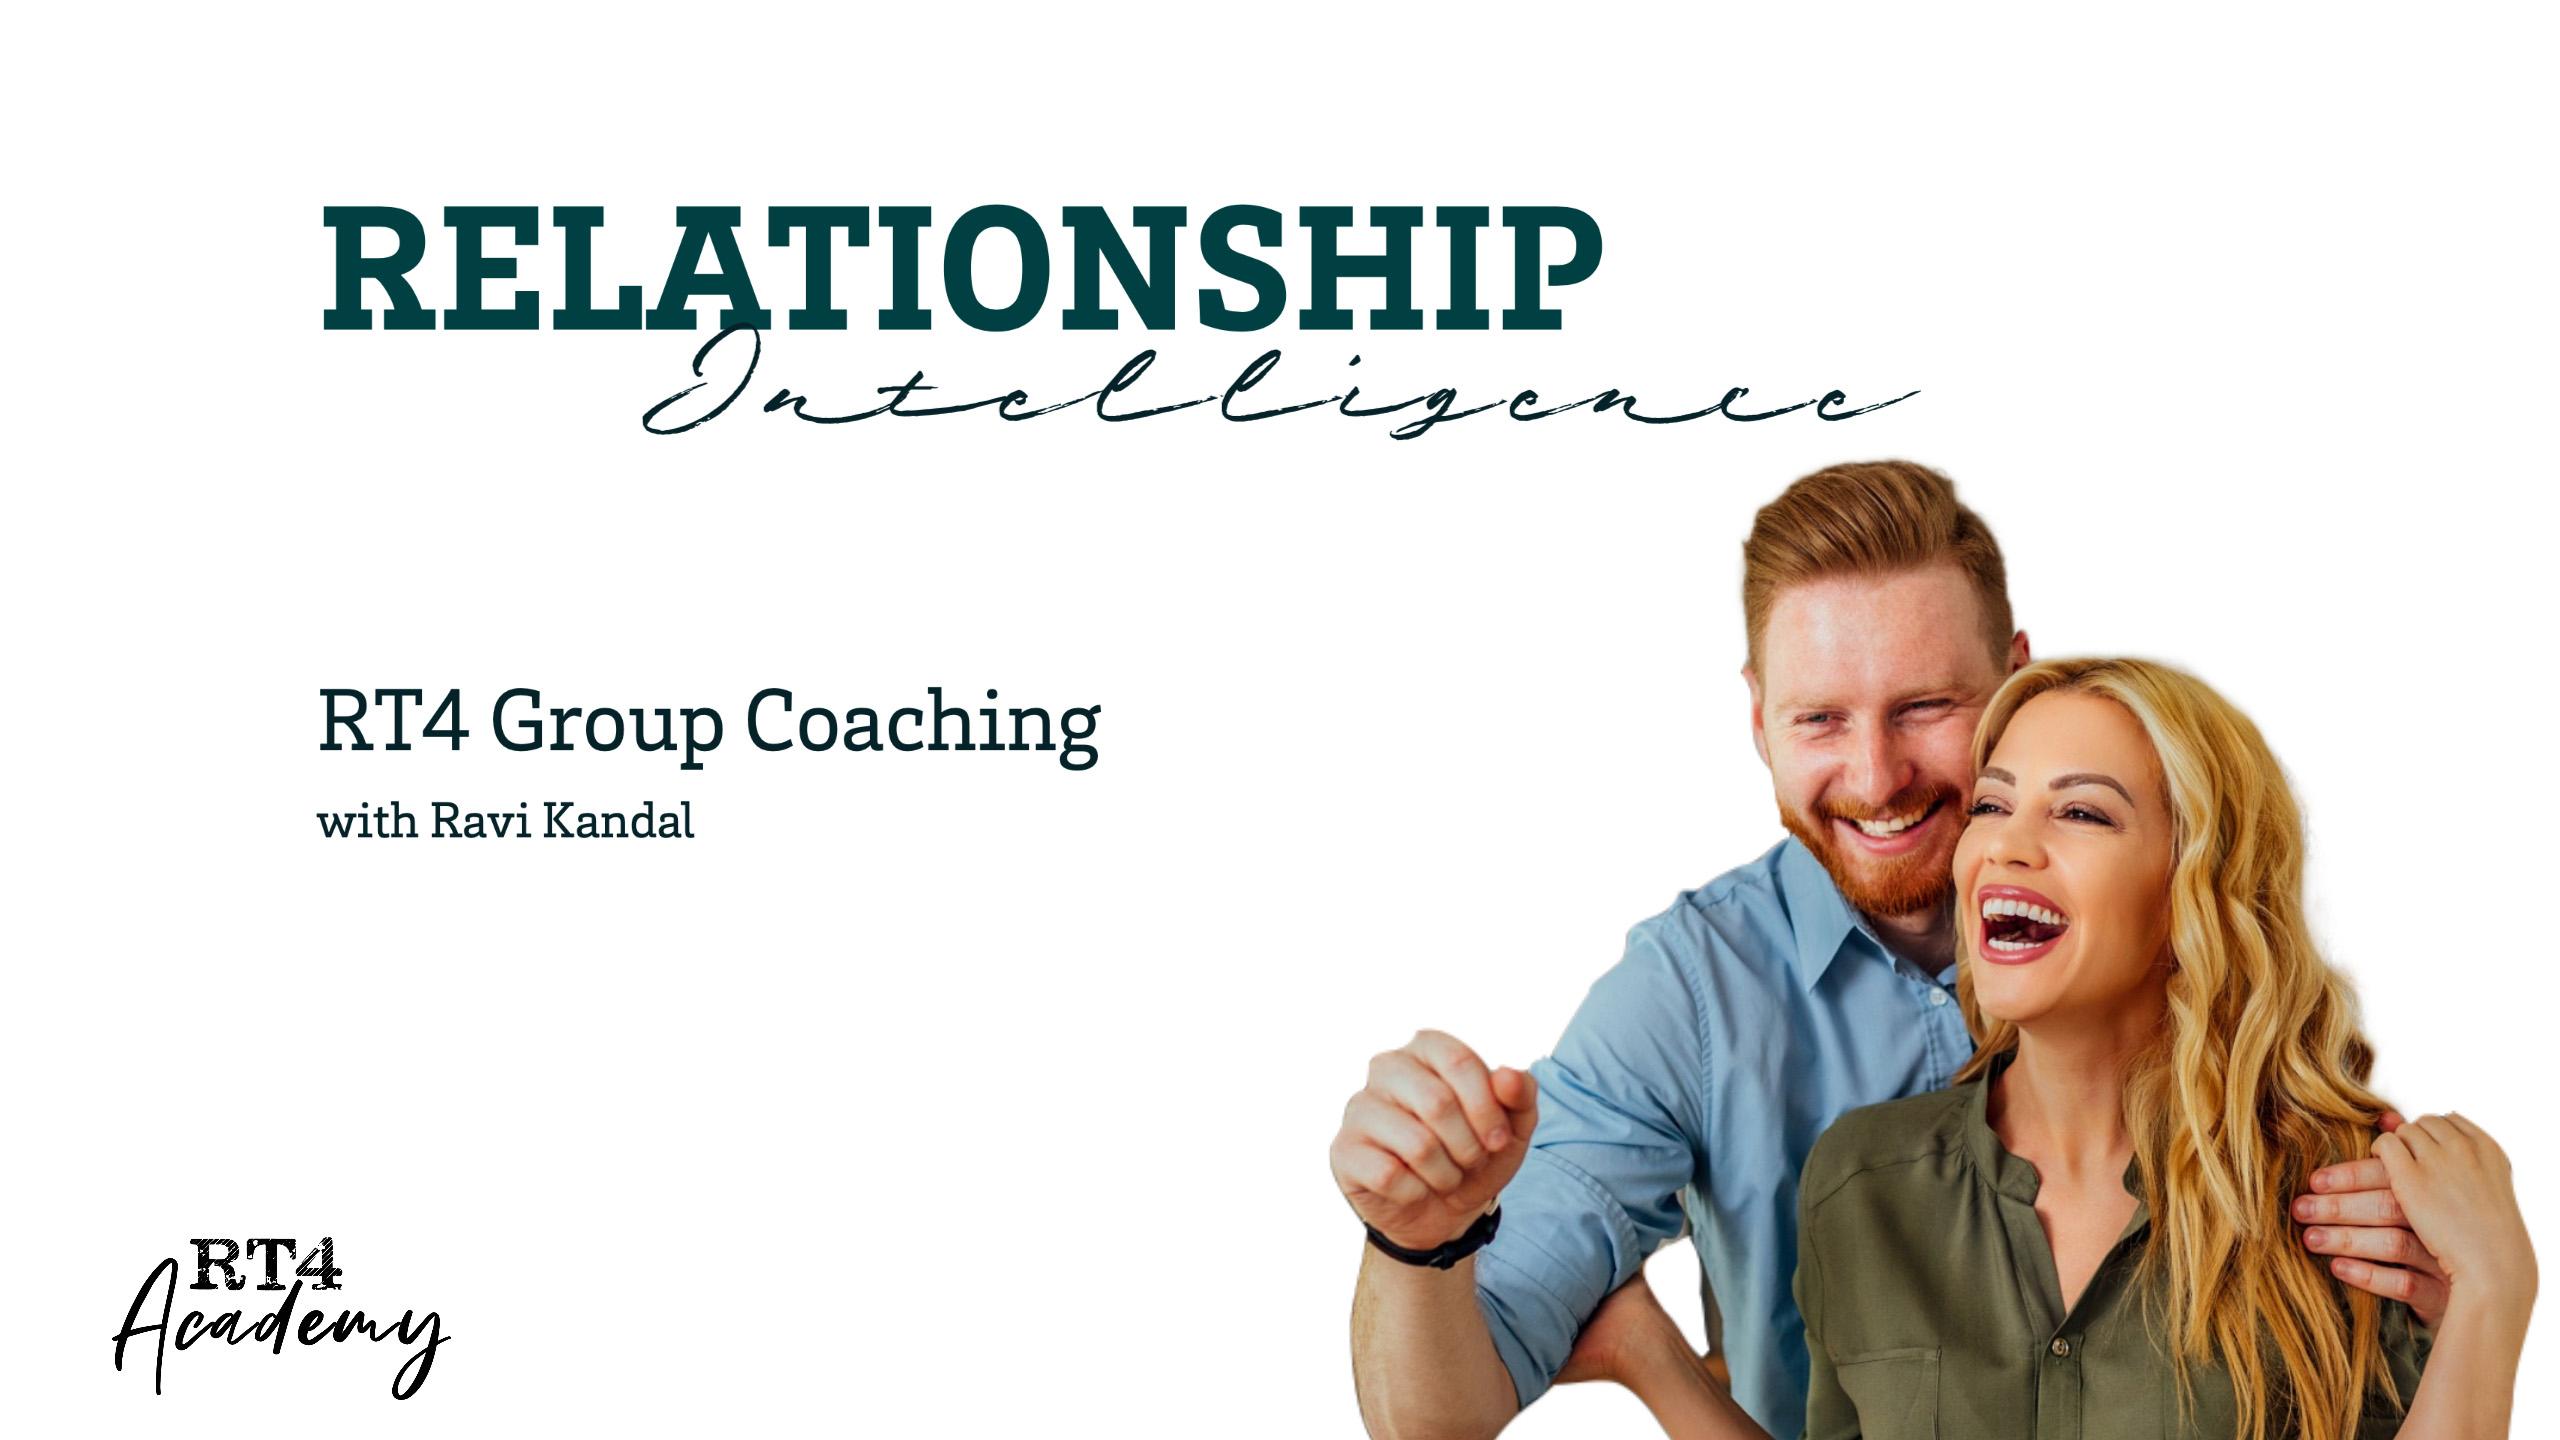 RT4 Relationship Intelligence Group Coaching